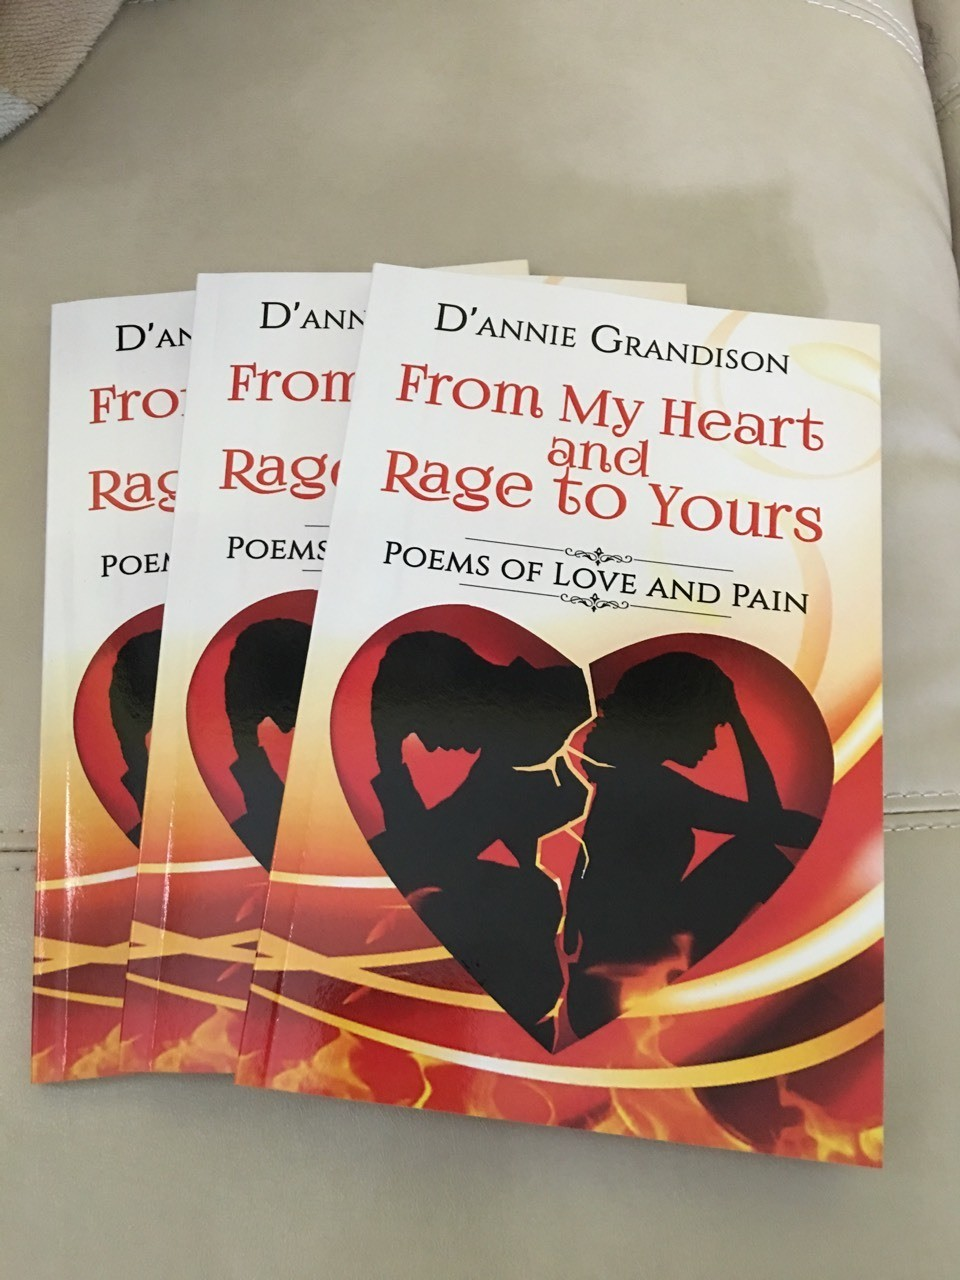 Grab a copy on Amazon